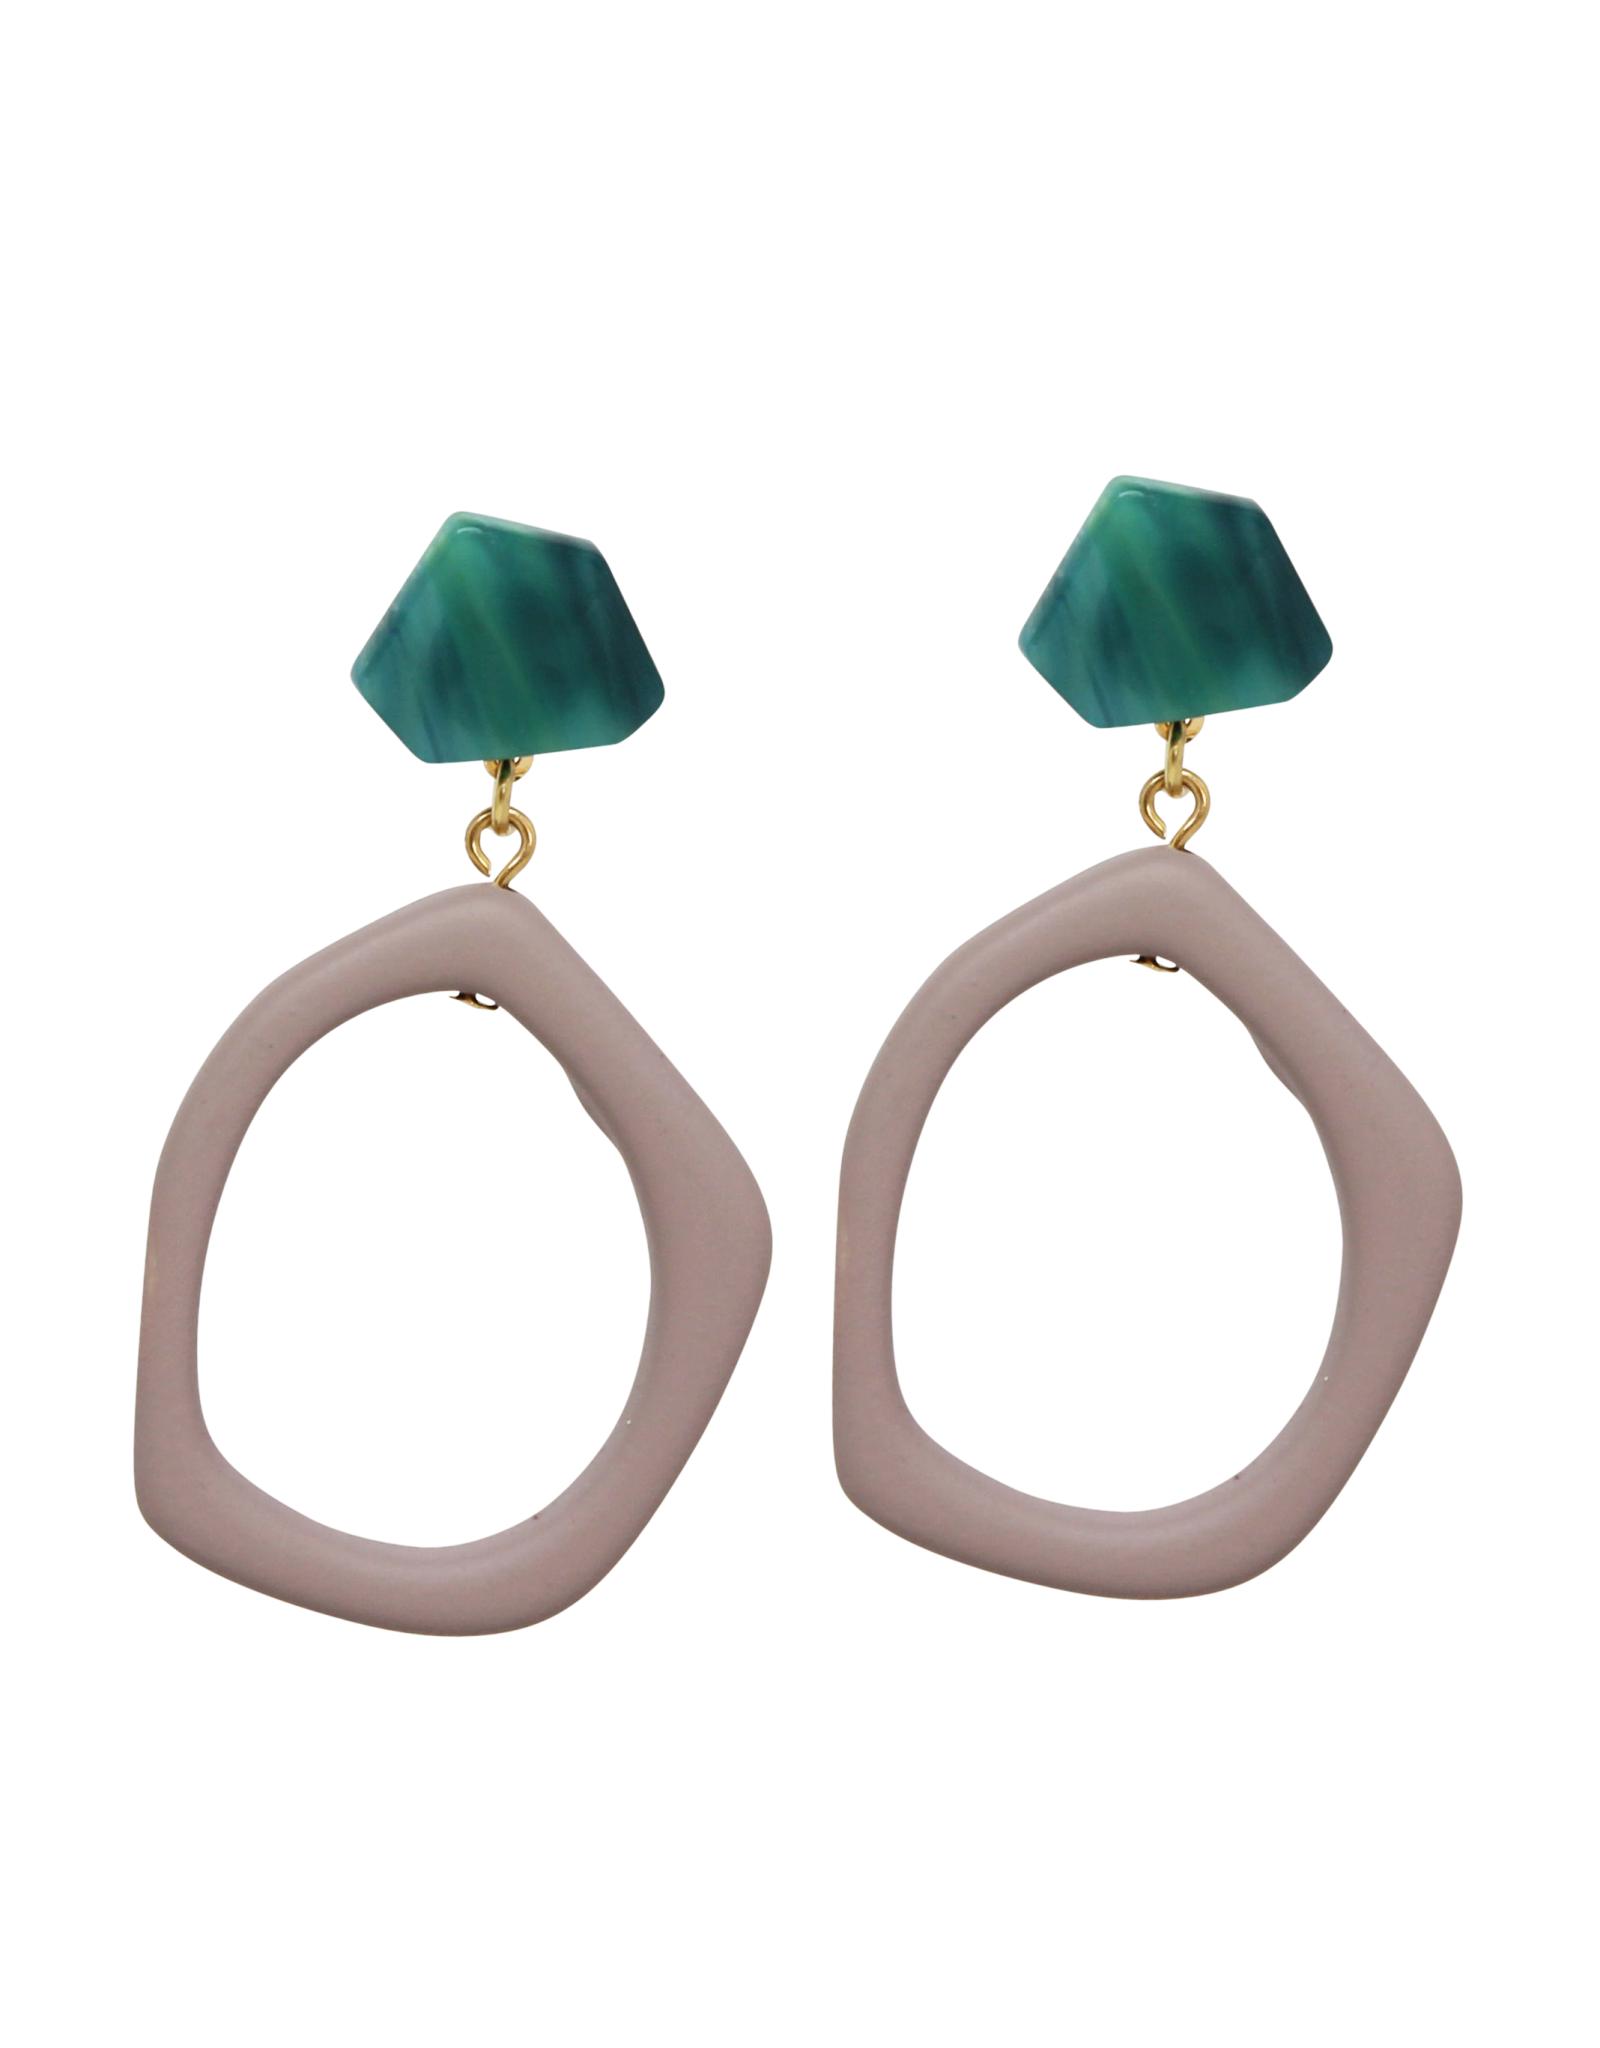 Vayu Jewels Grecia Earrings - Emerald + Putty